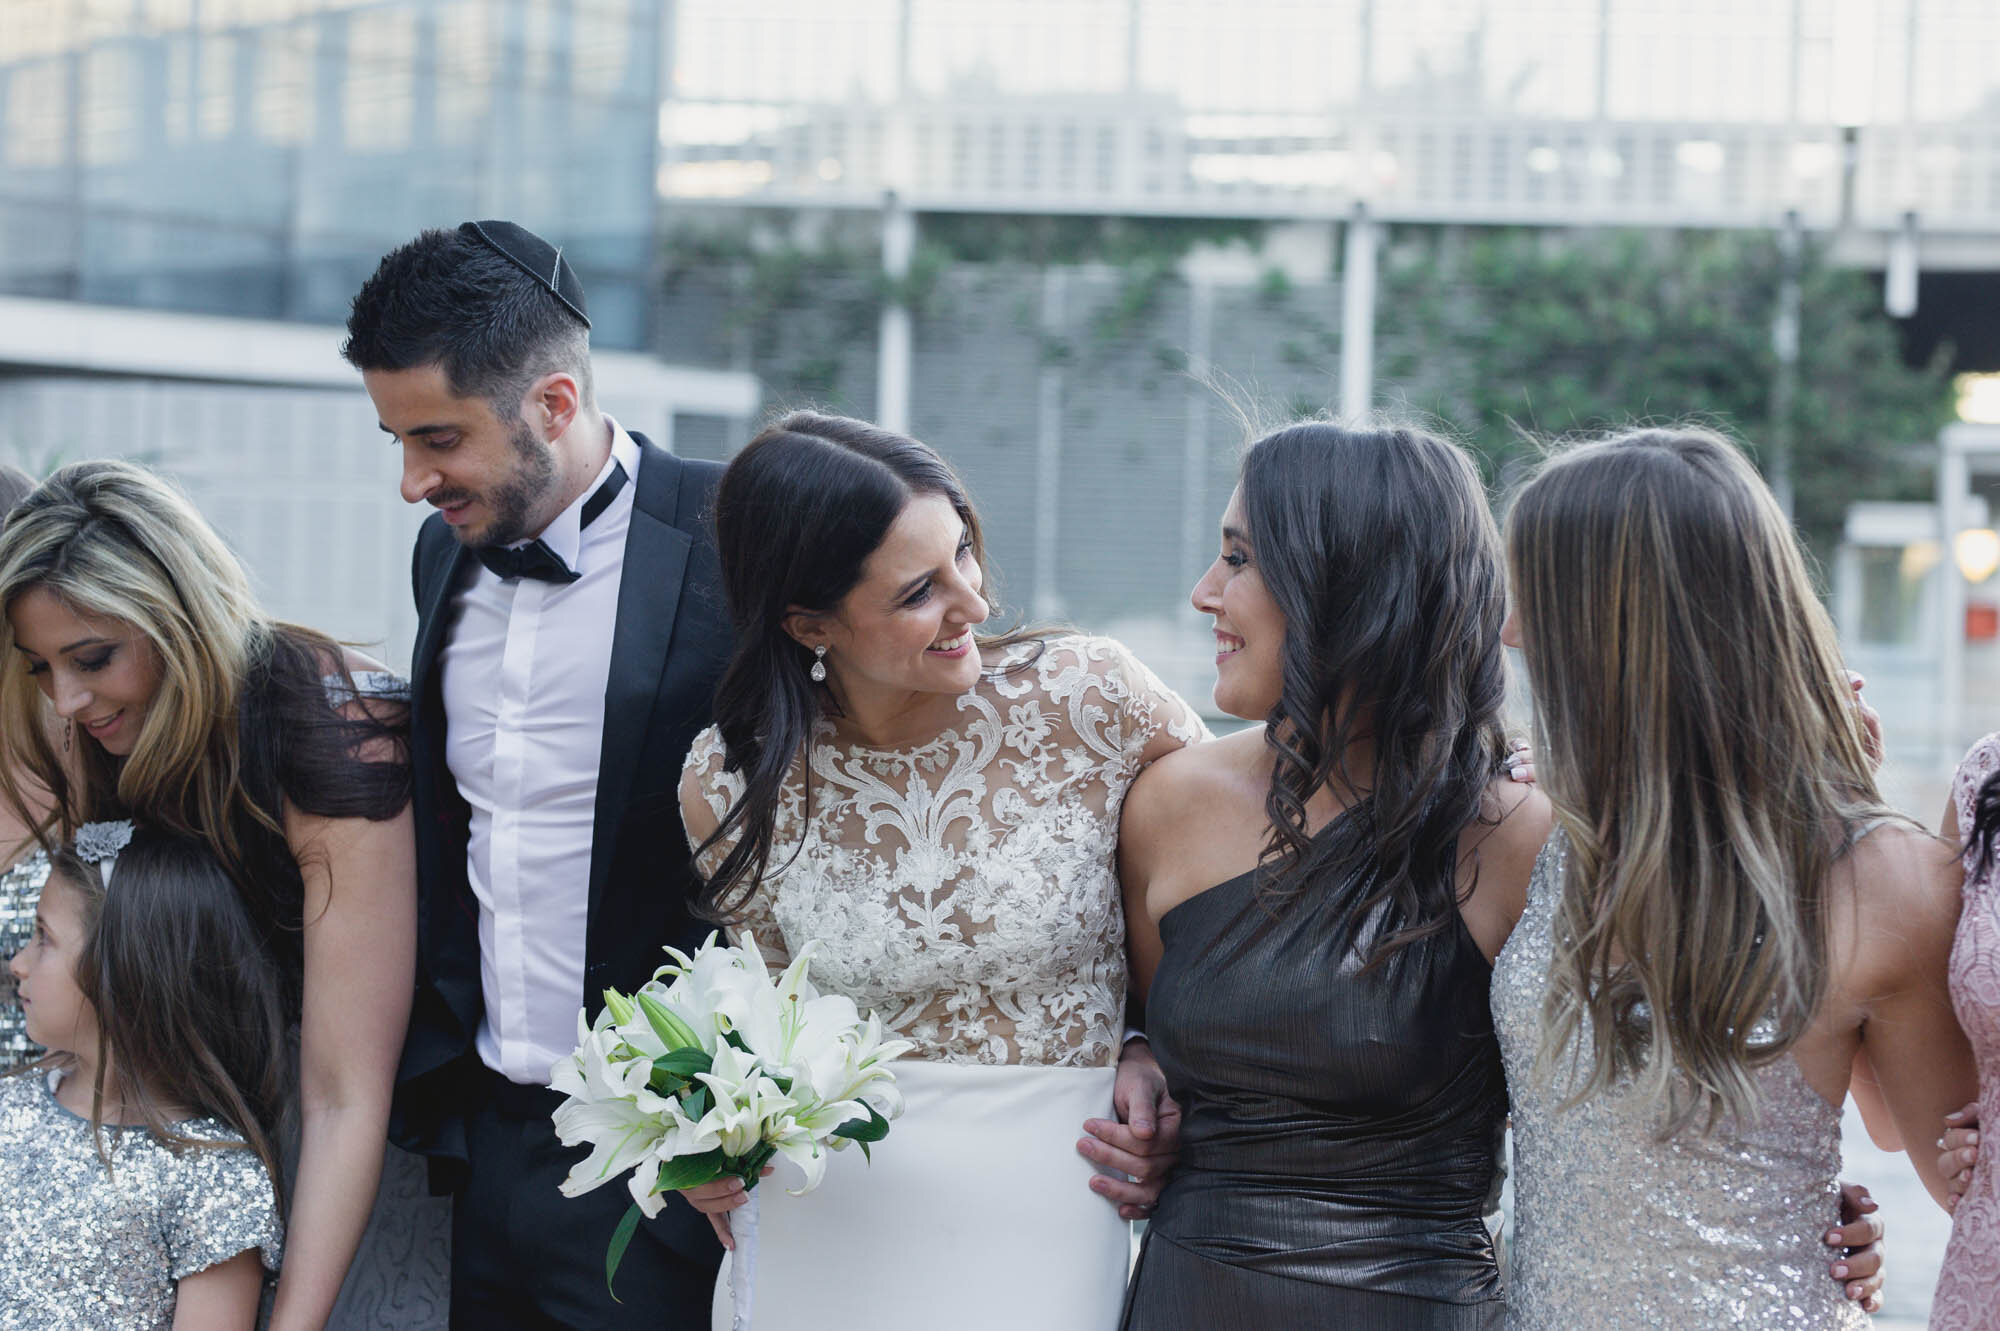 john-henry-wedding-photographer-ceremony001-50.jpg